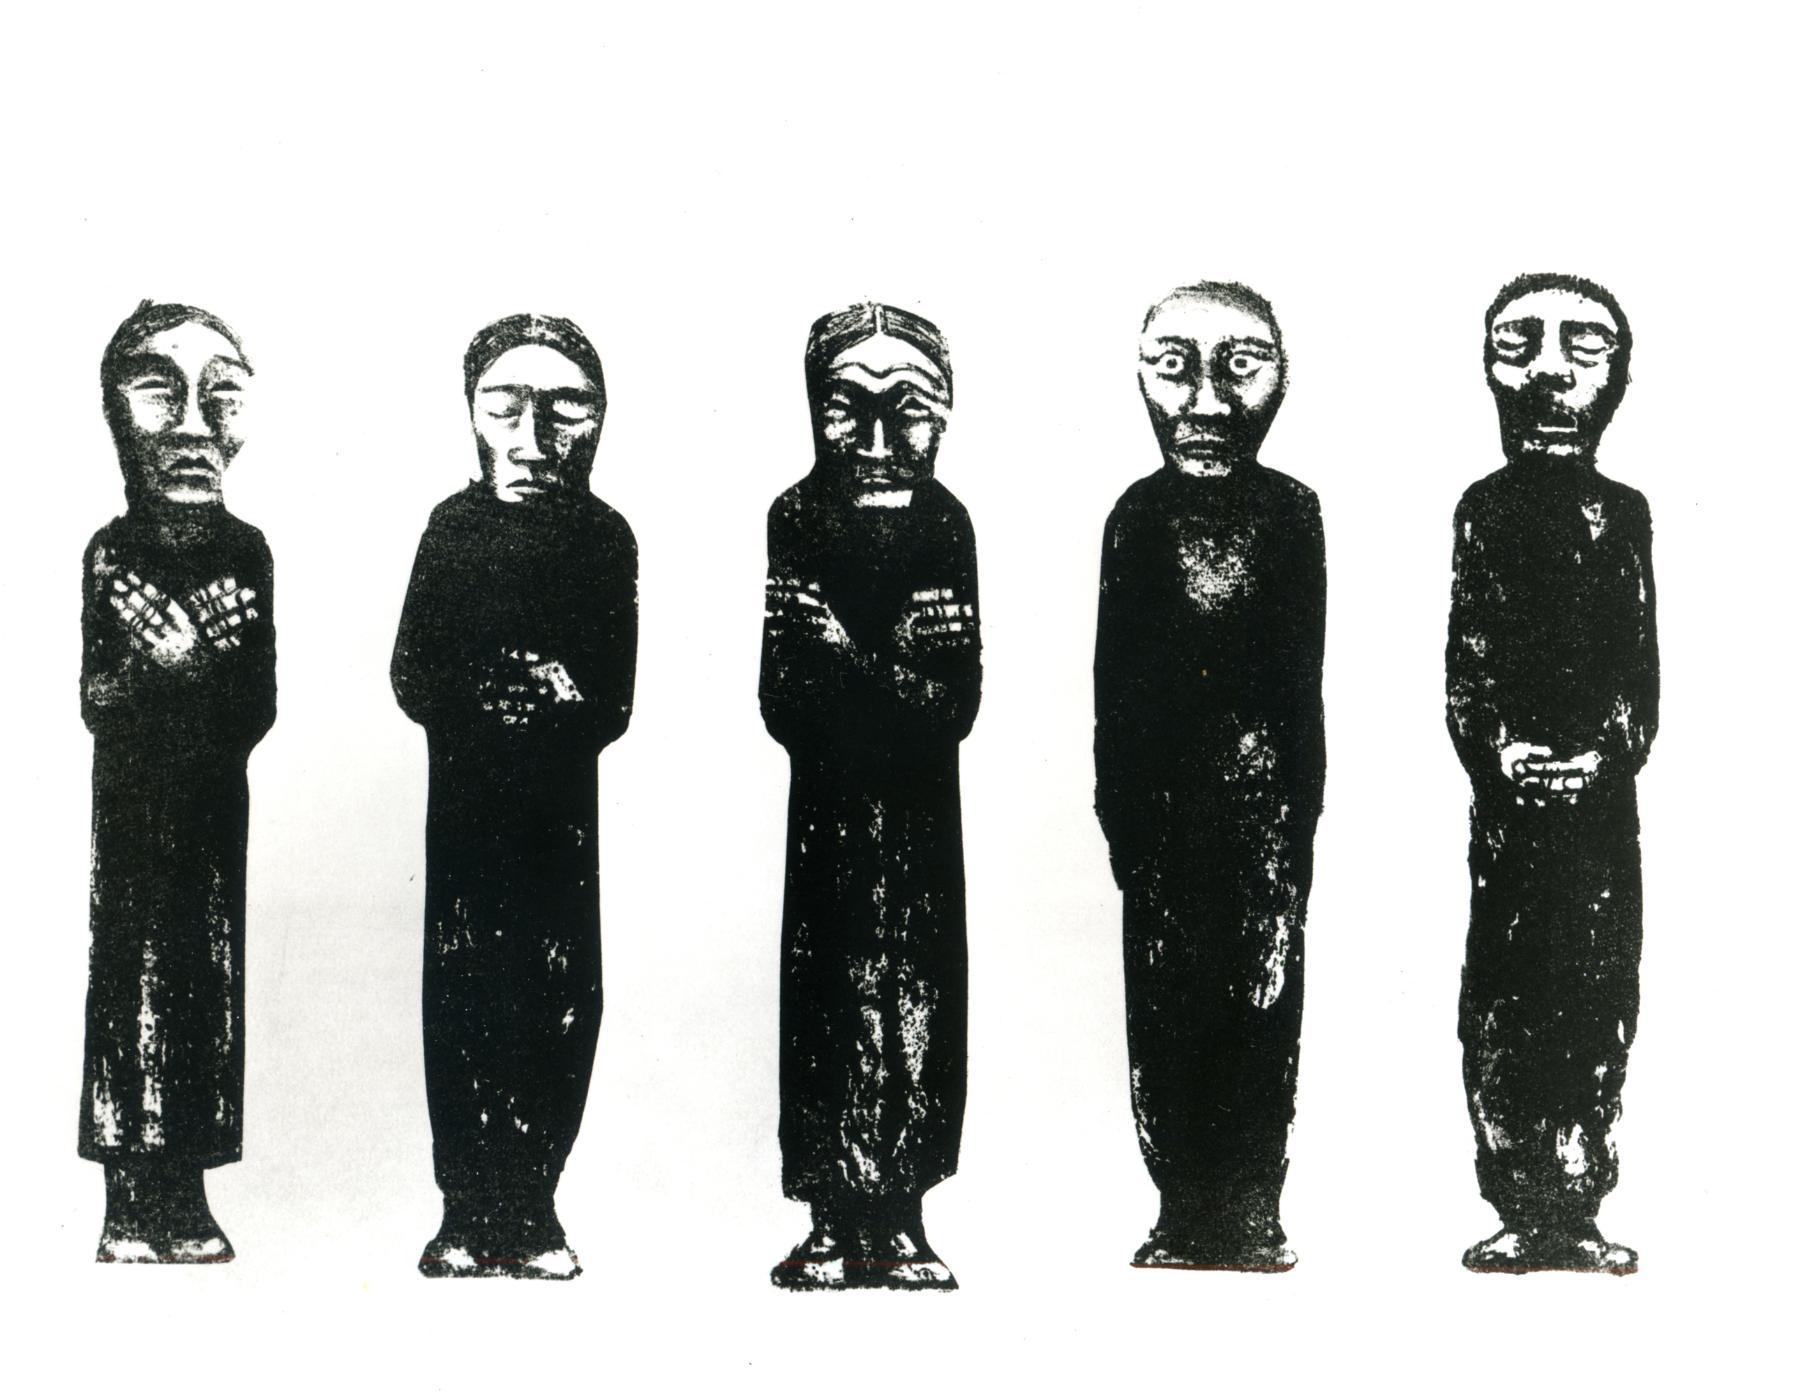 Sending Off the Spirits of the Dead | 炭鉱で死んだ朝鮮人強制運行の坑夫に捧げる (1985)